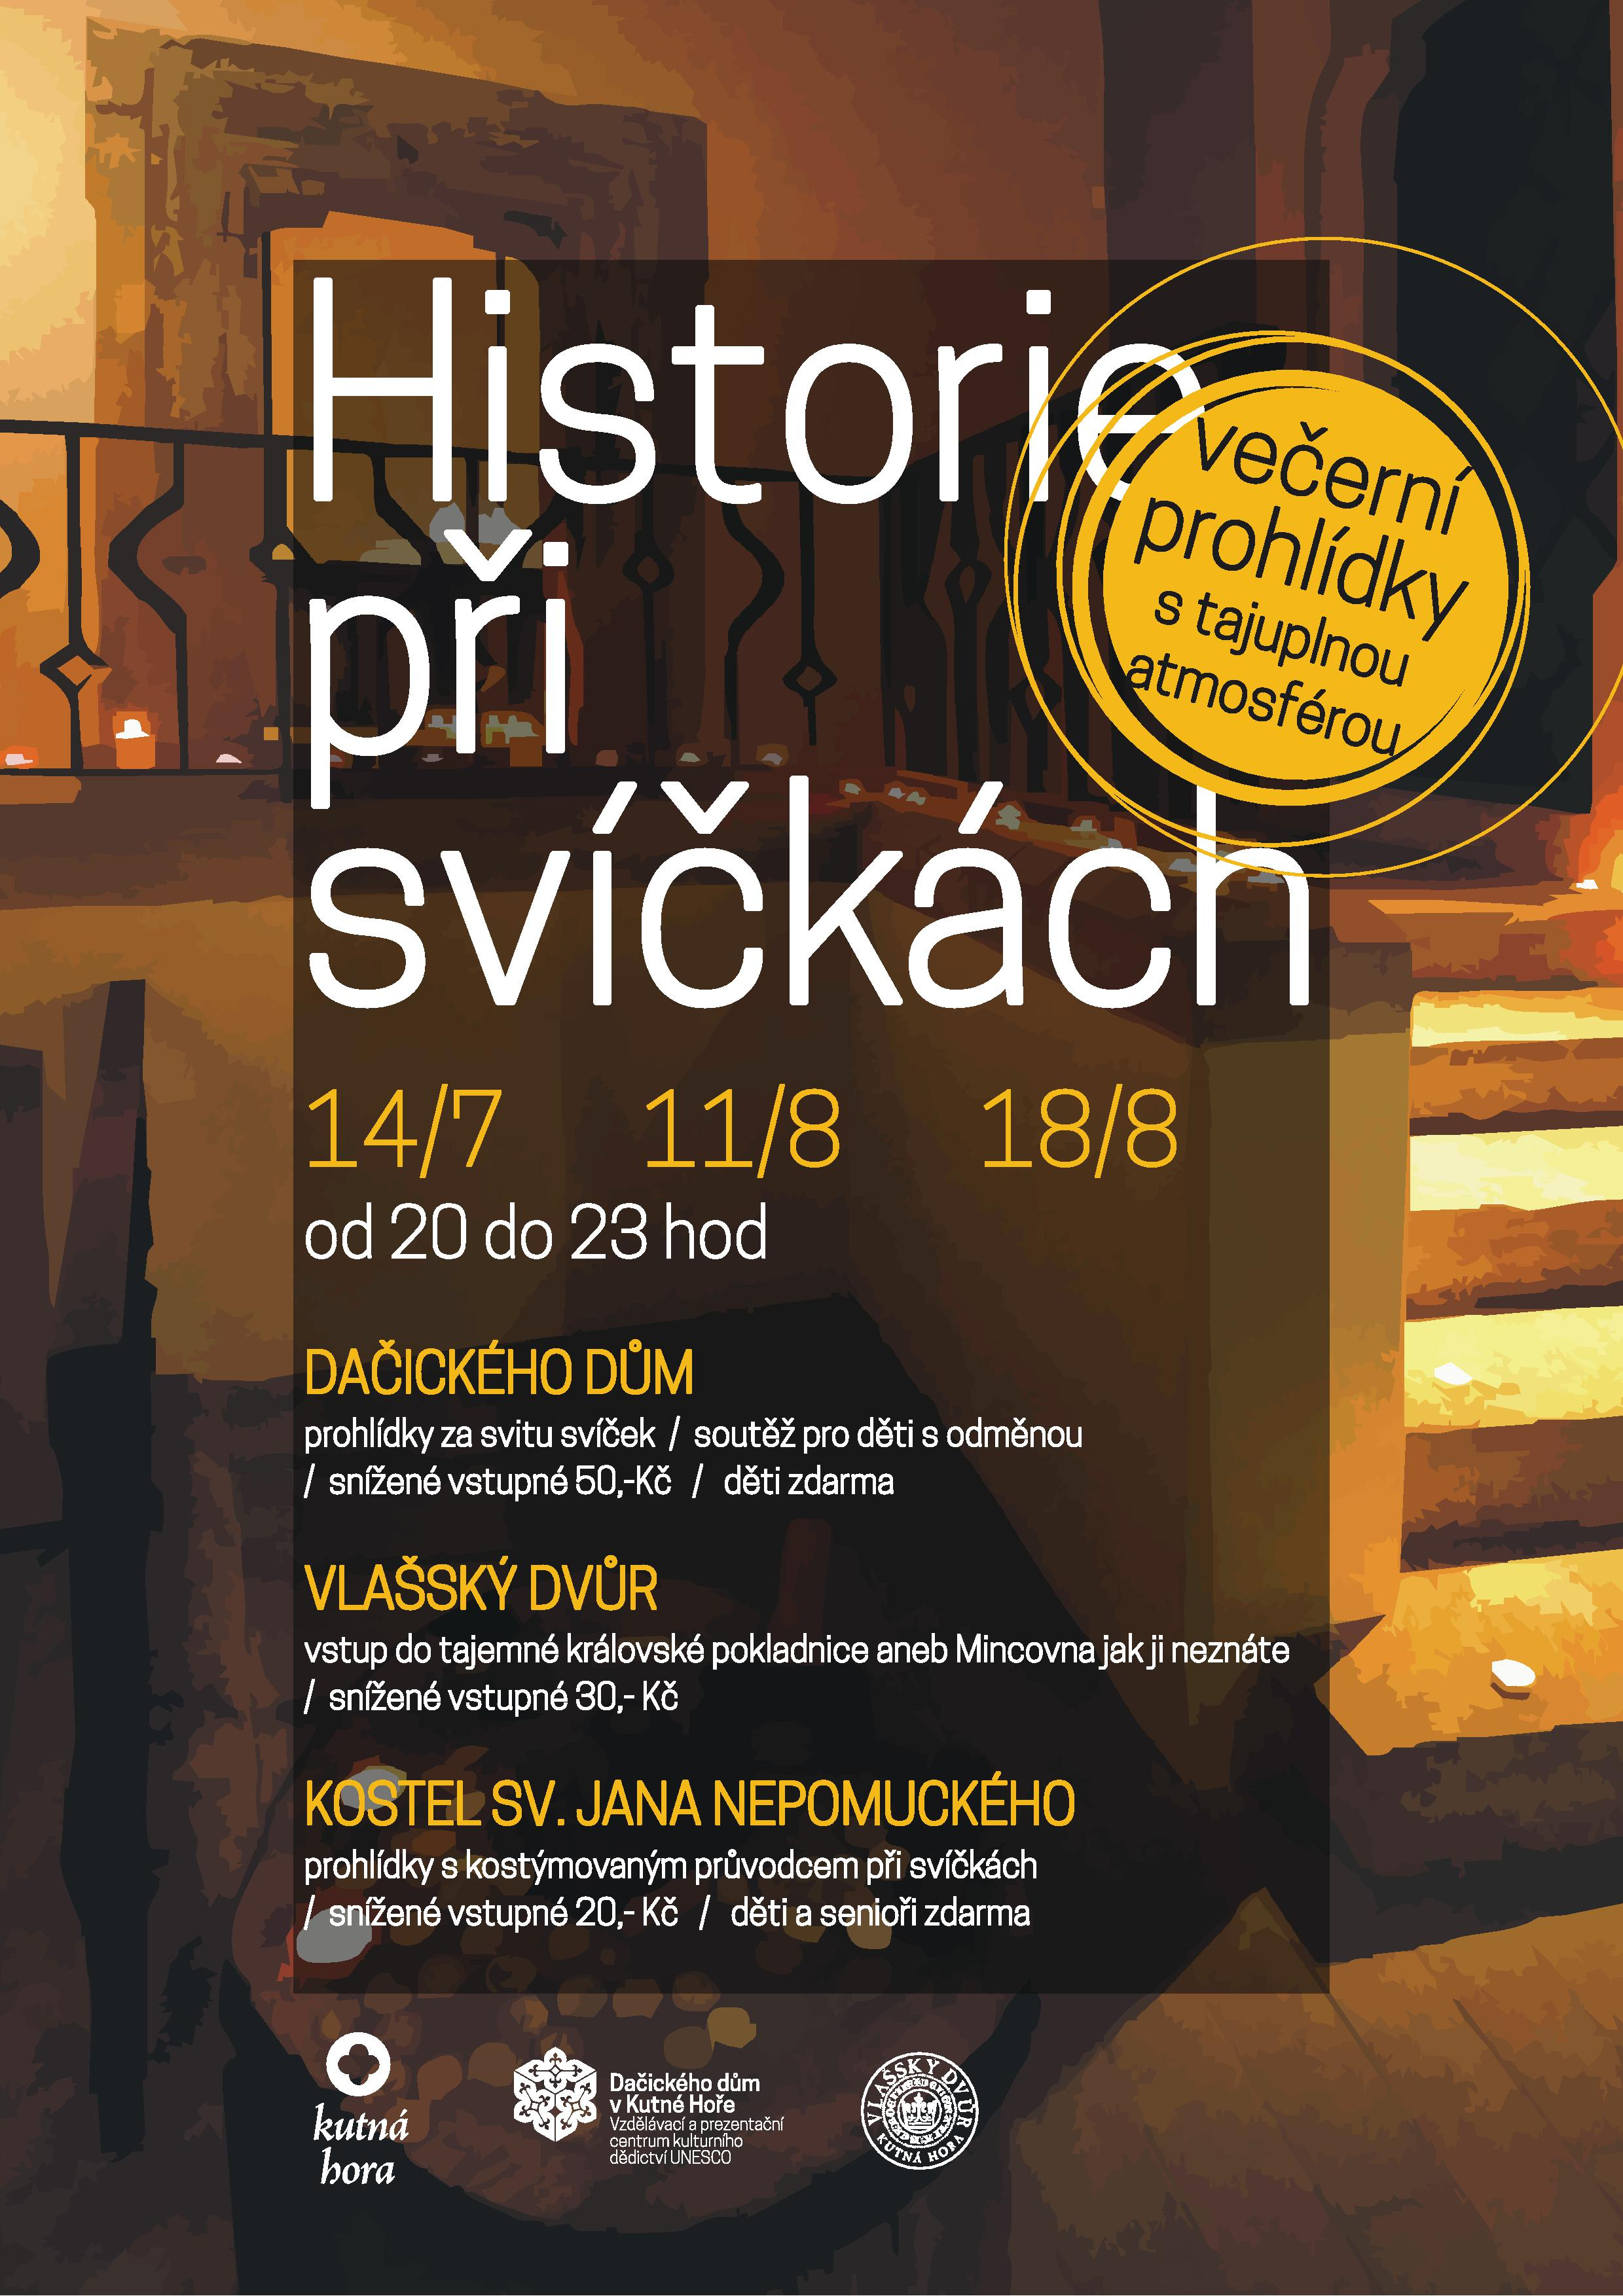 3862-historie-pri-svickach-plakat-03.jpg